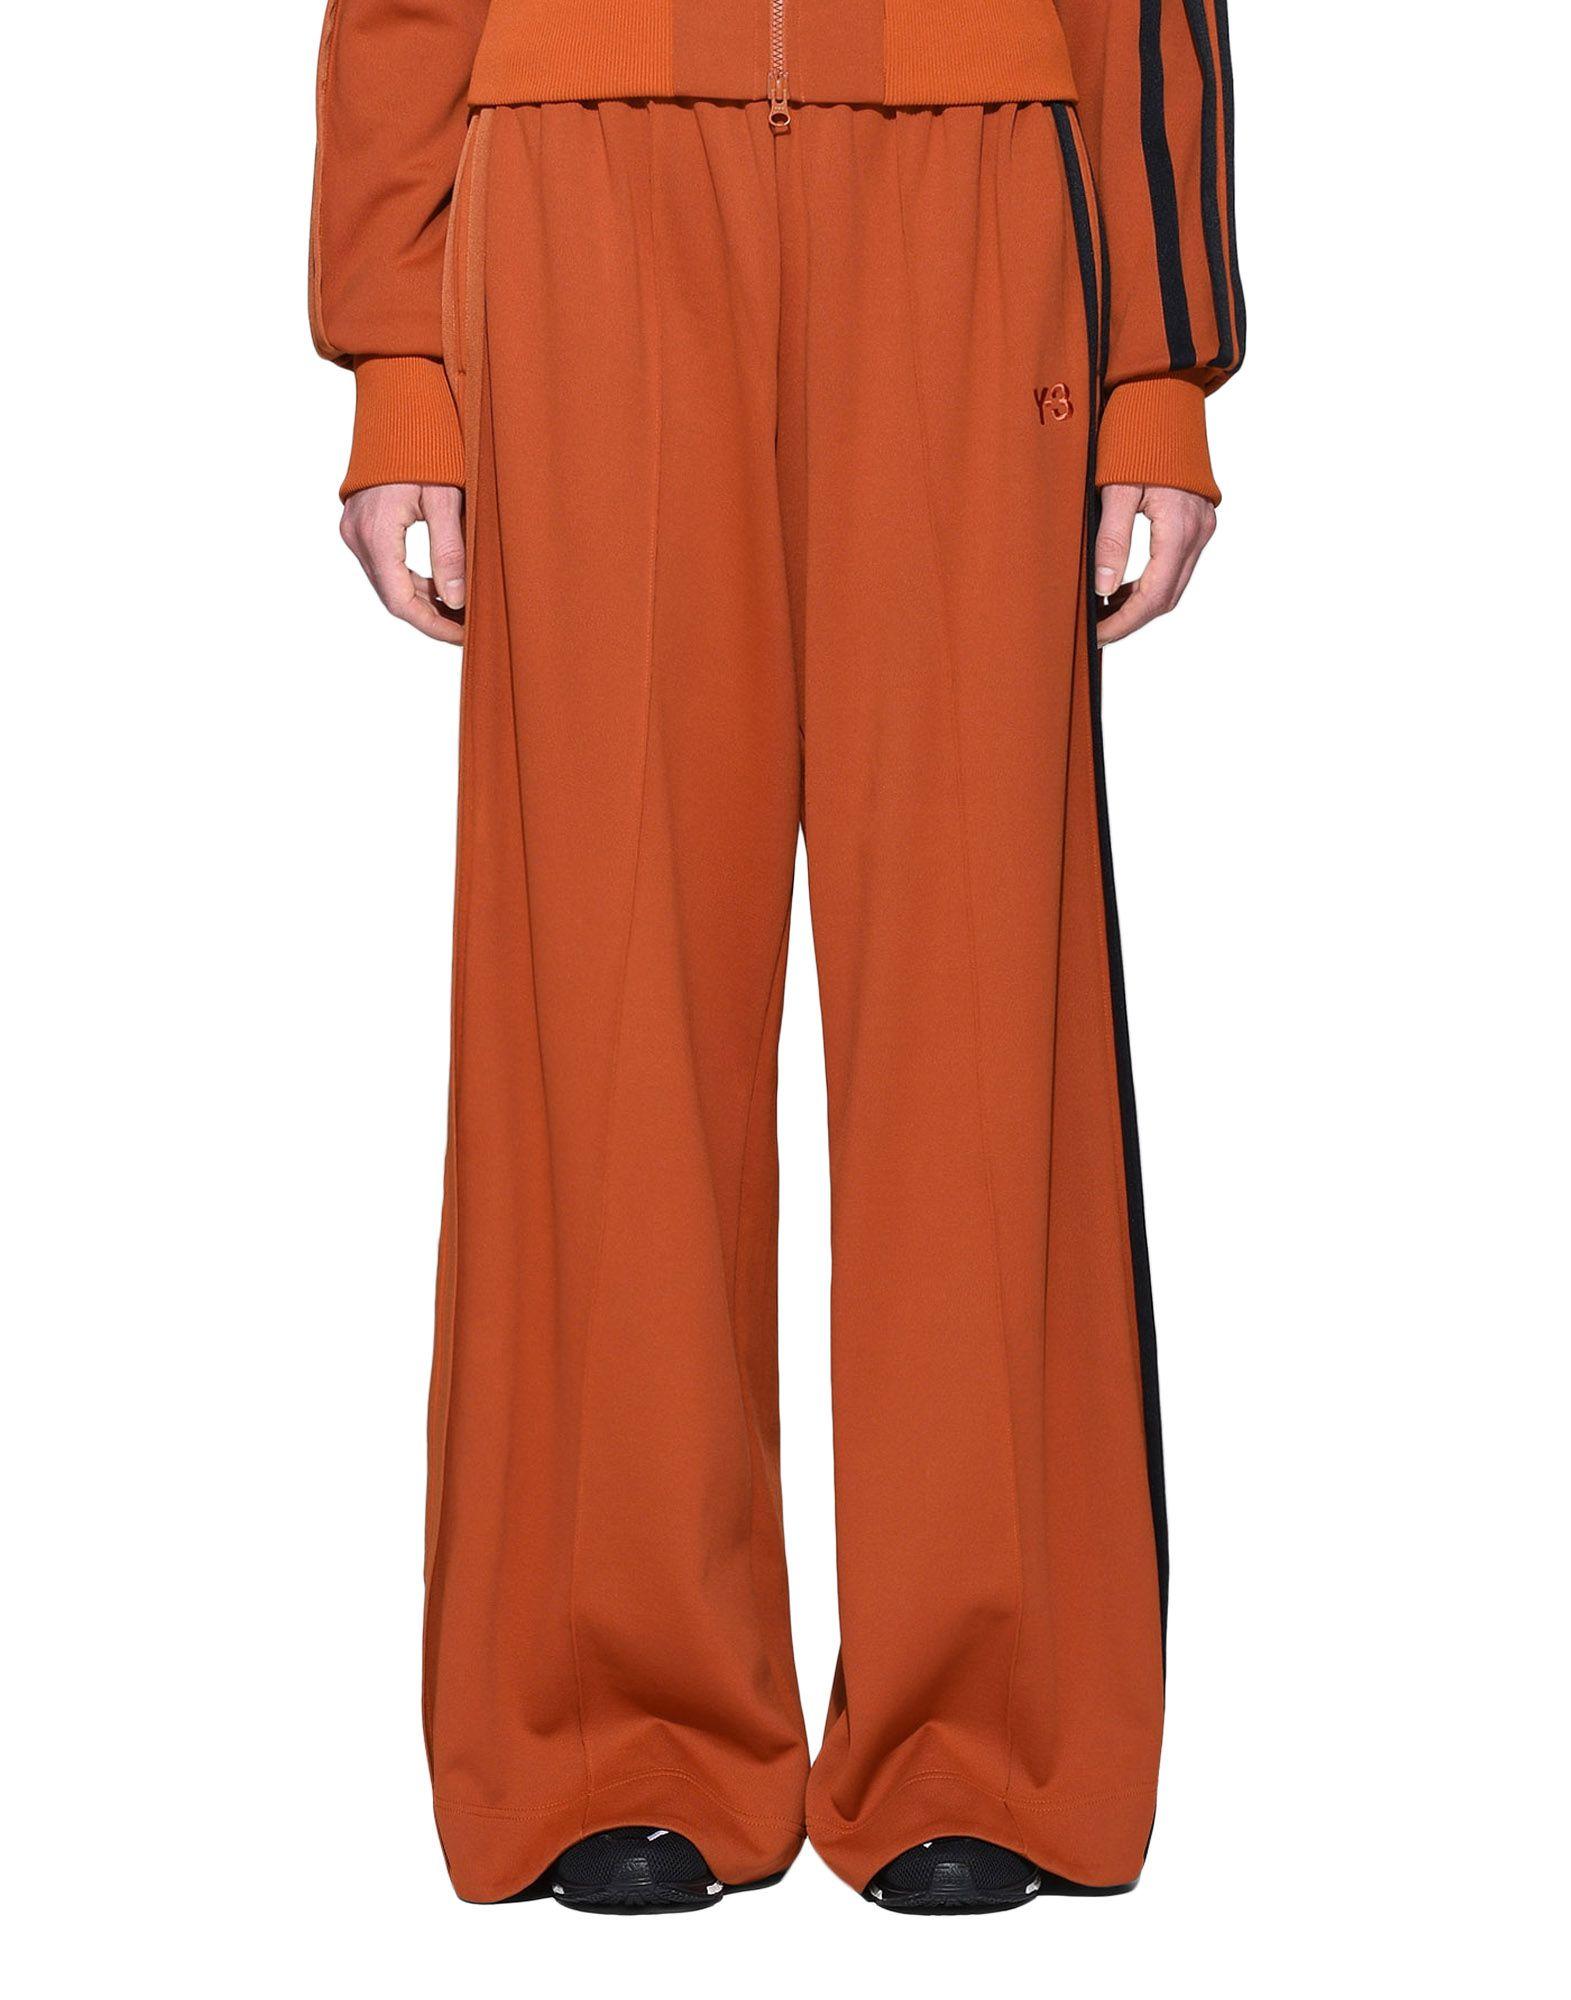 Y-3 Y-3 3-Stripes Selvedge Matte Track Pants Track pant Woman r